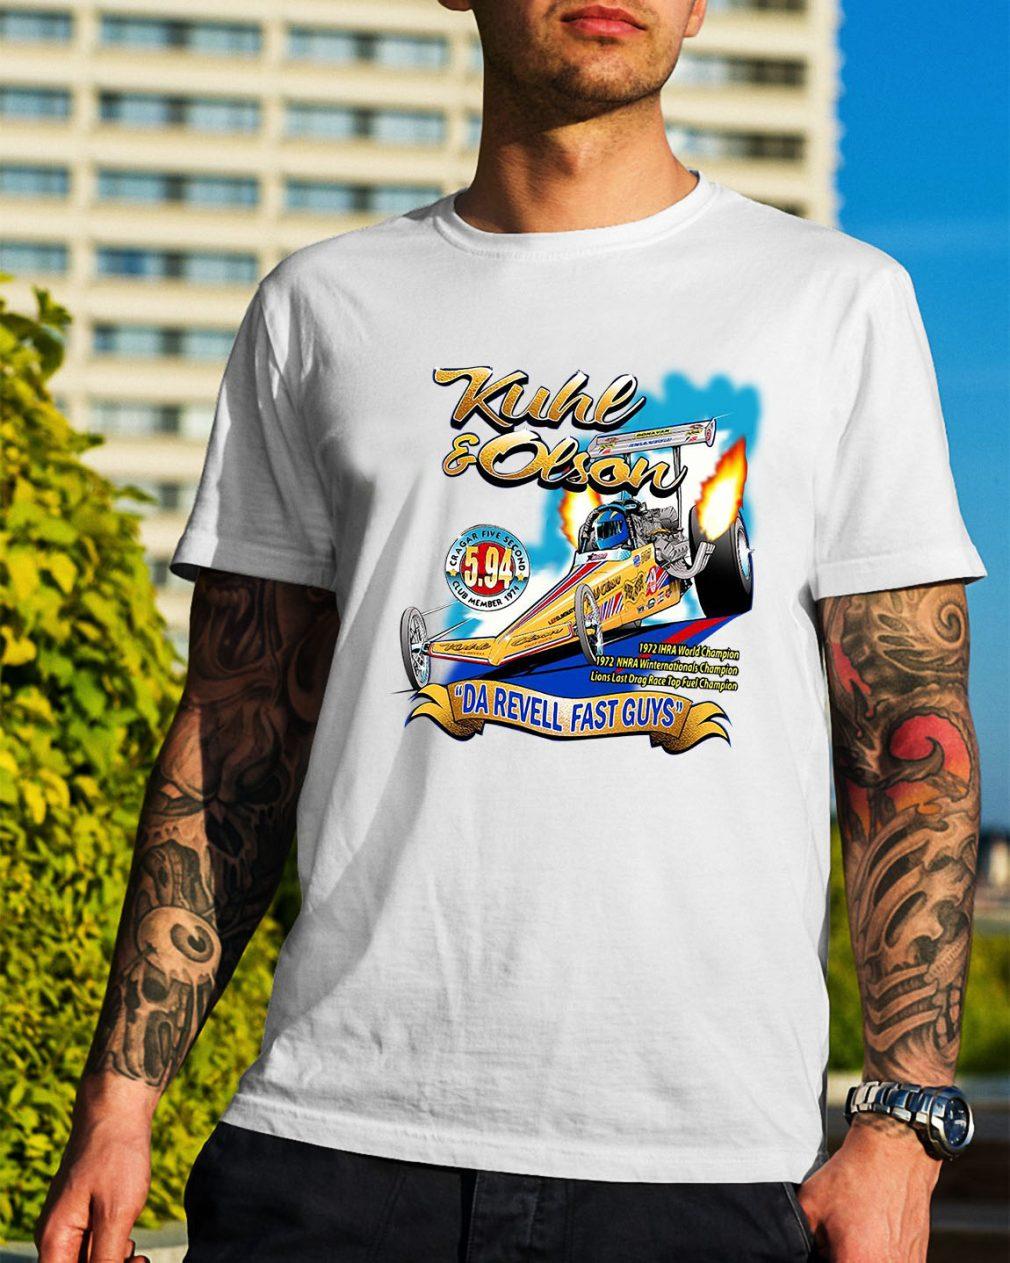 Kuhl and Olson Da Revell fast guys shirt